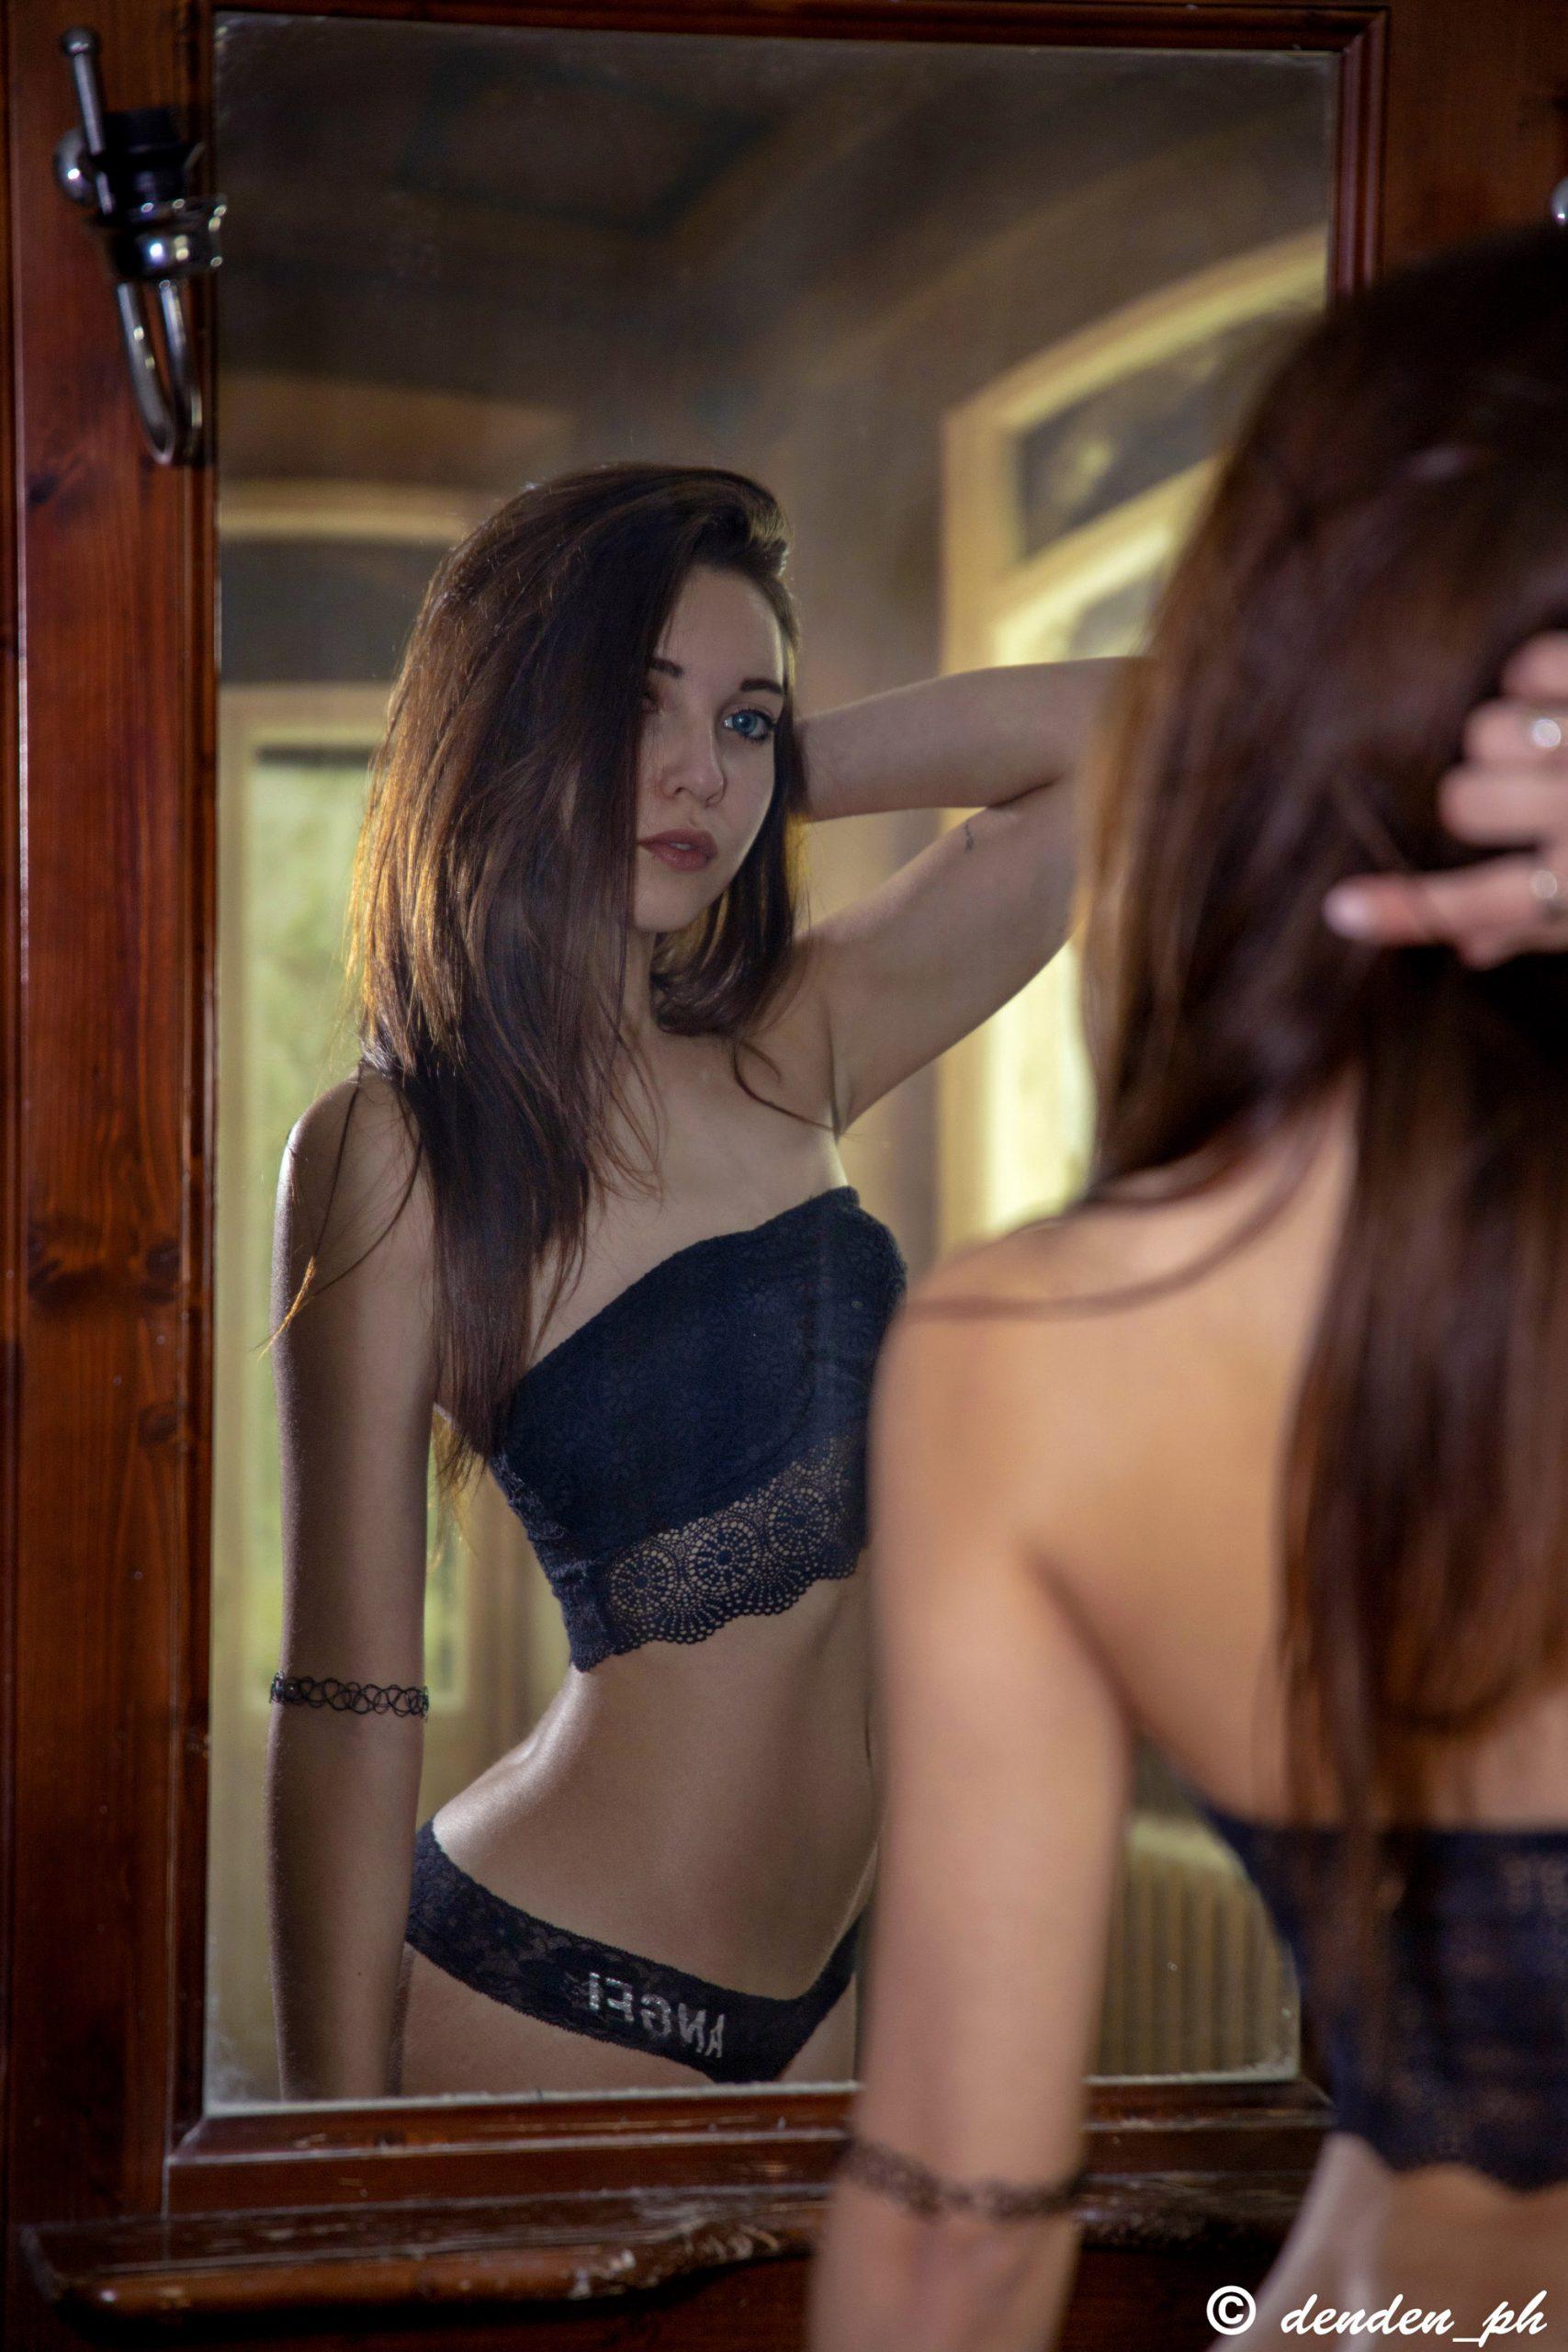 Categorie: Boudoir & Nude, Glamour, Portrait; Photographer: DENDEN.PH; Model: DESY FAORO; Location:Tezze sul Brenta, VI, Italia